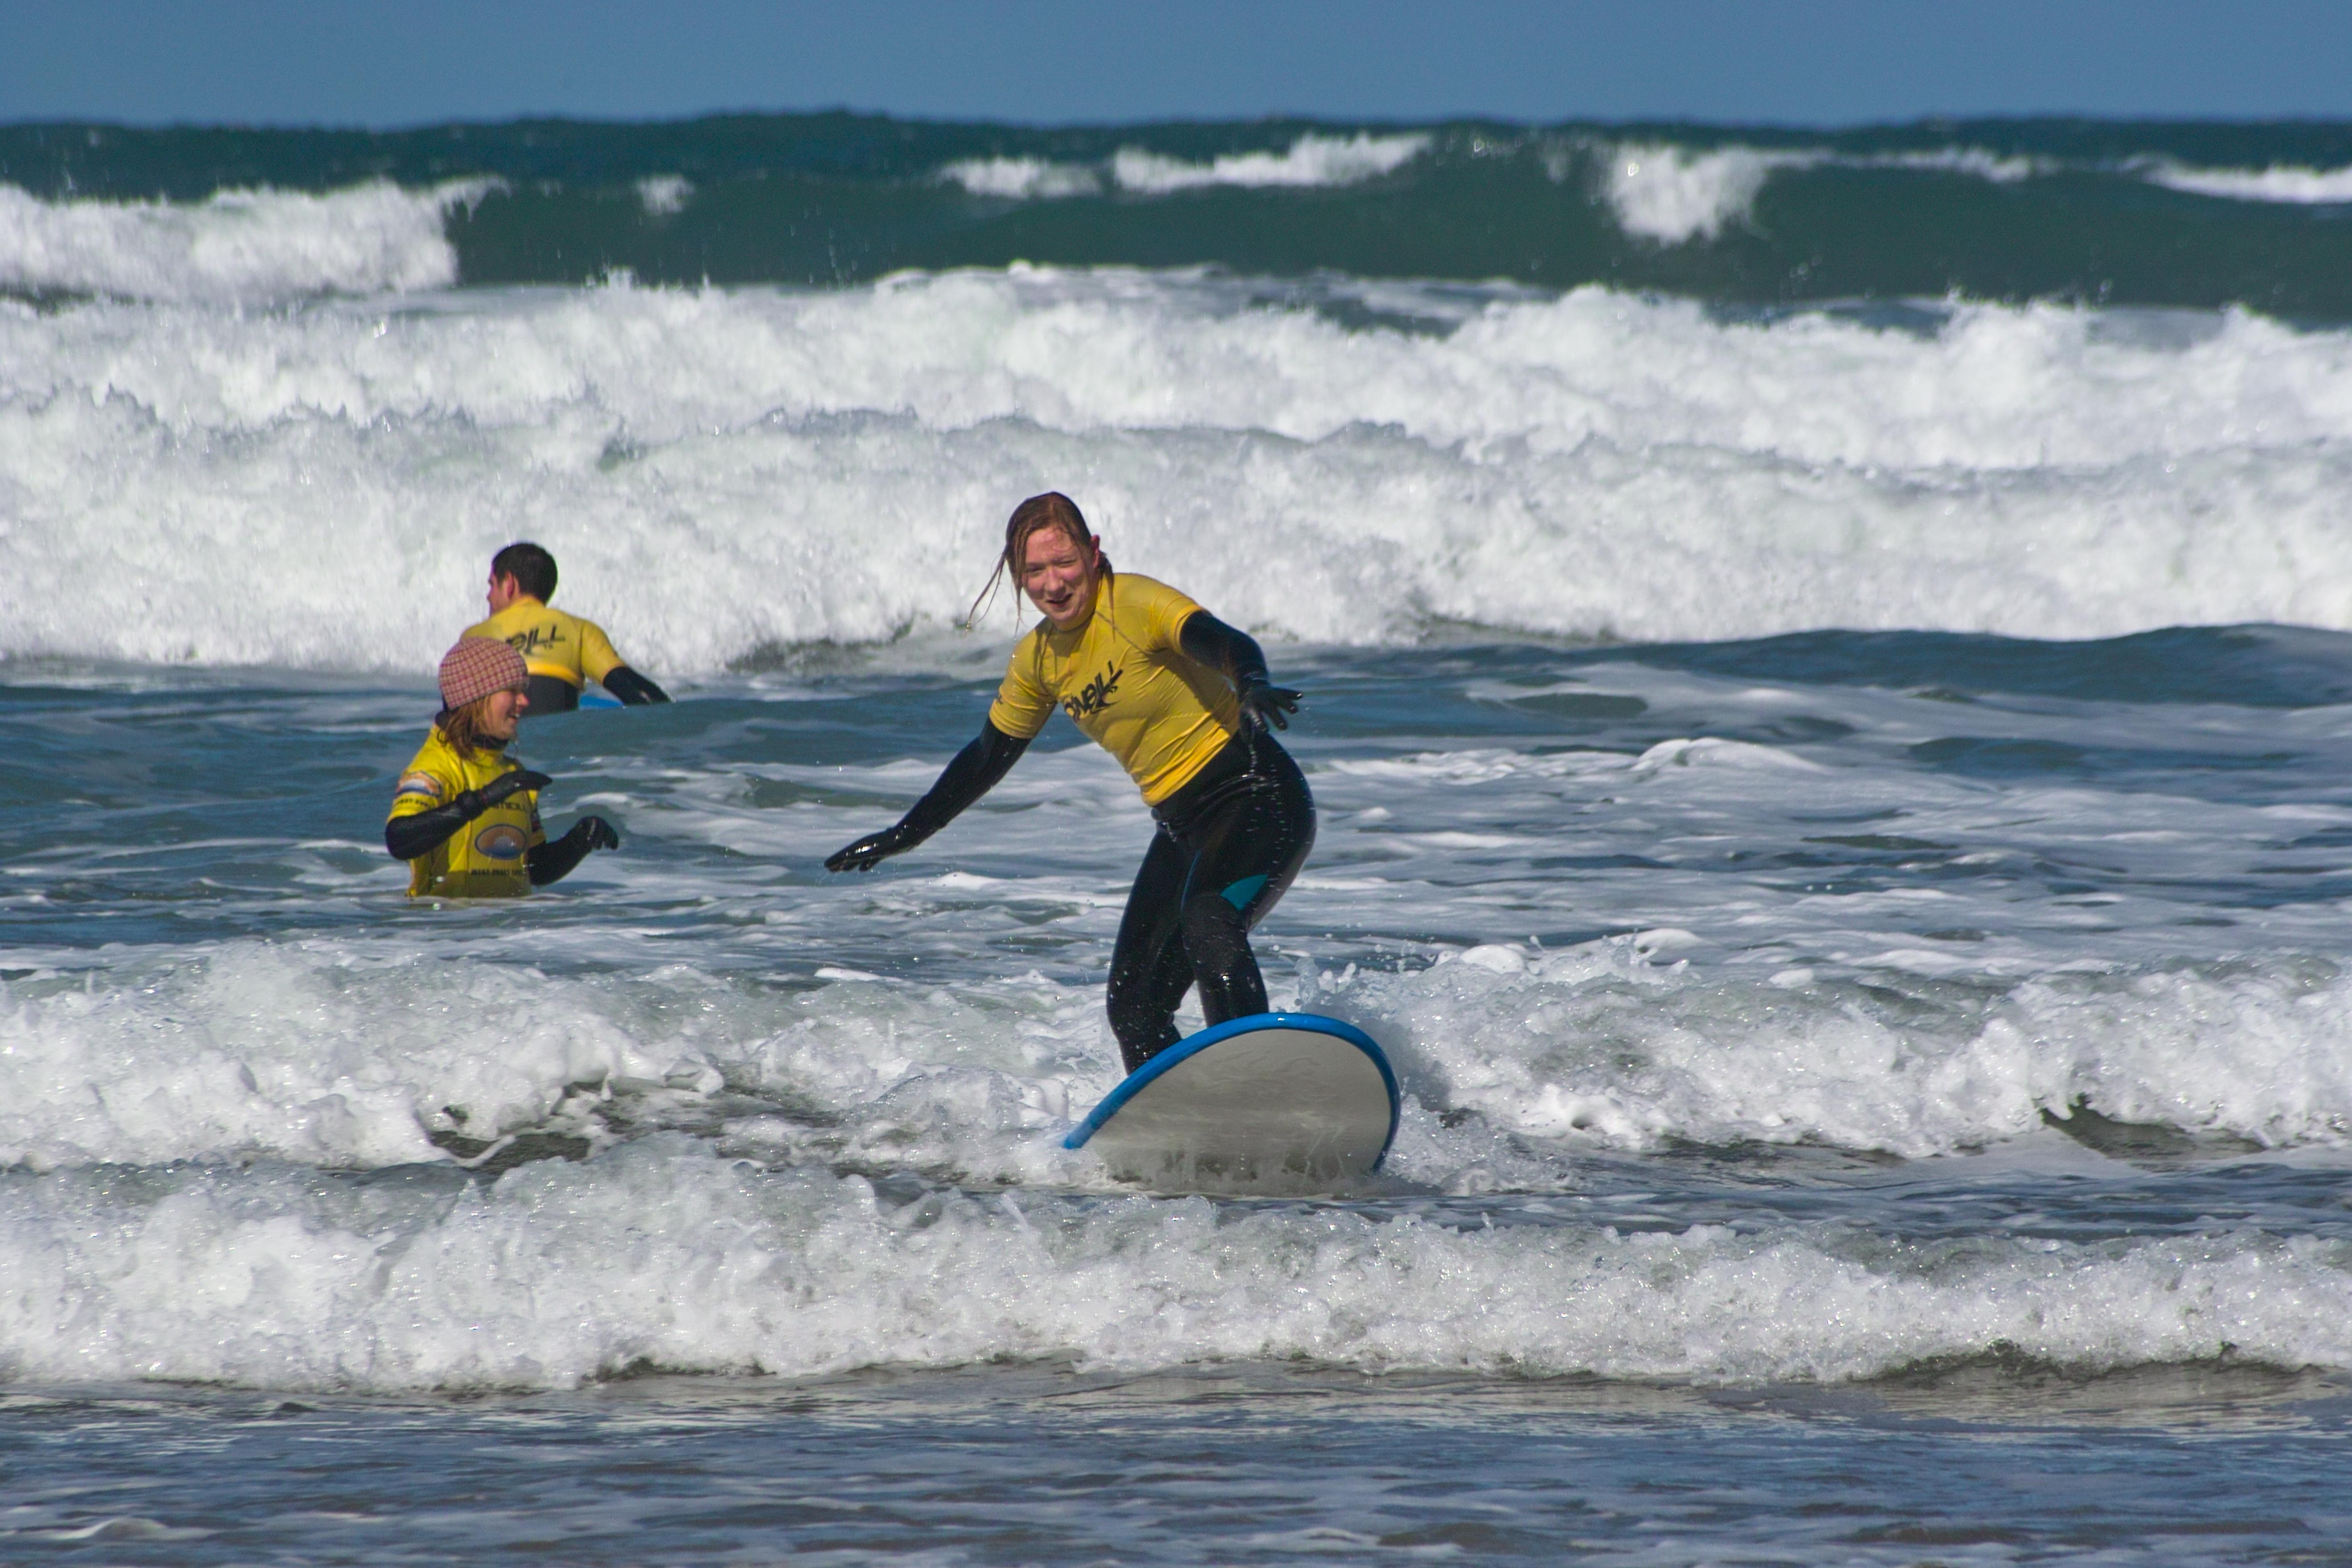 Surfing – Soooooo Much Fun!